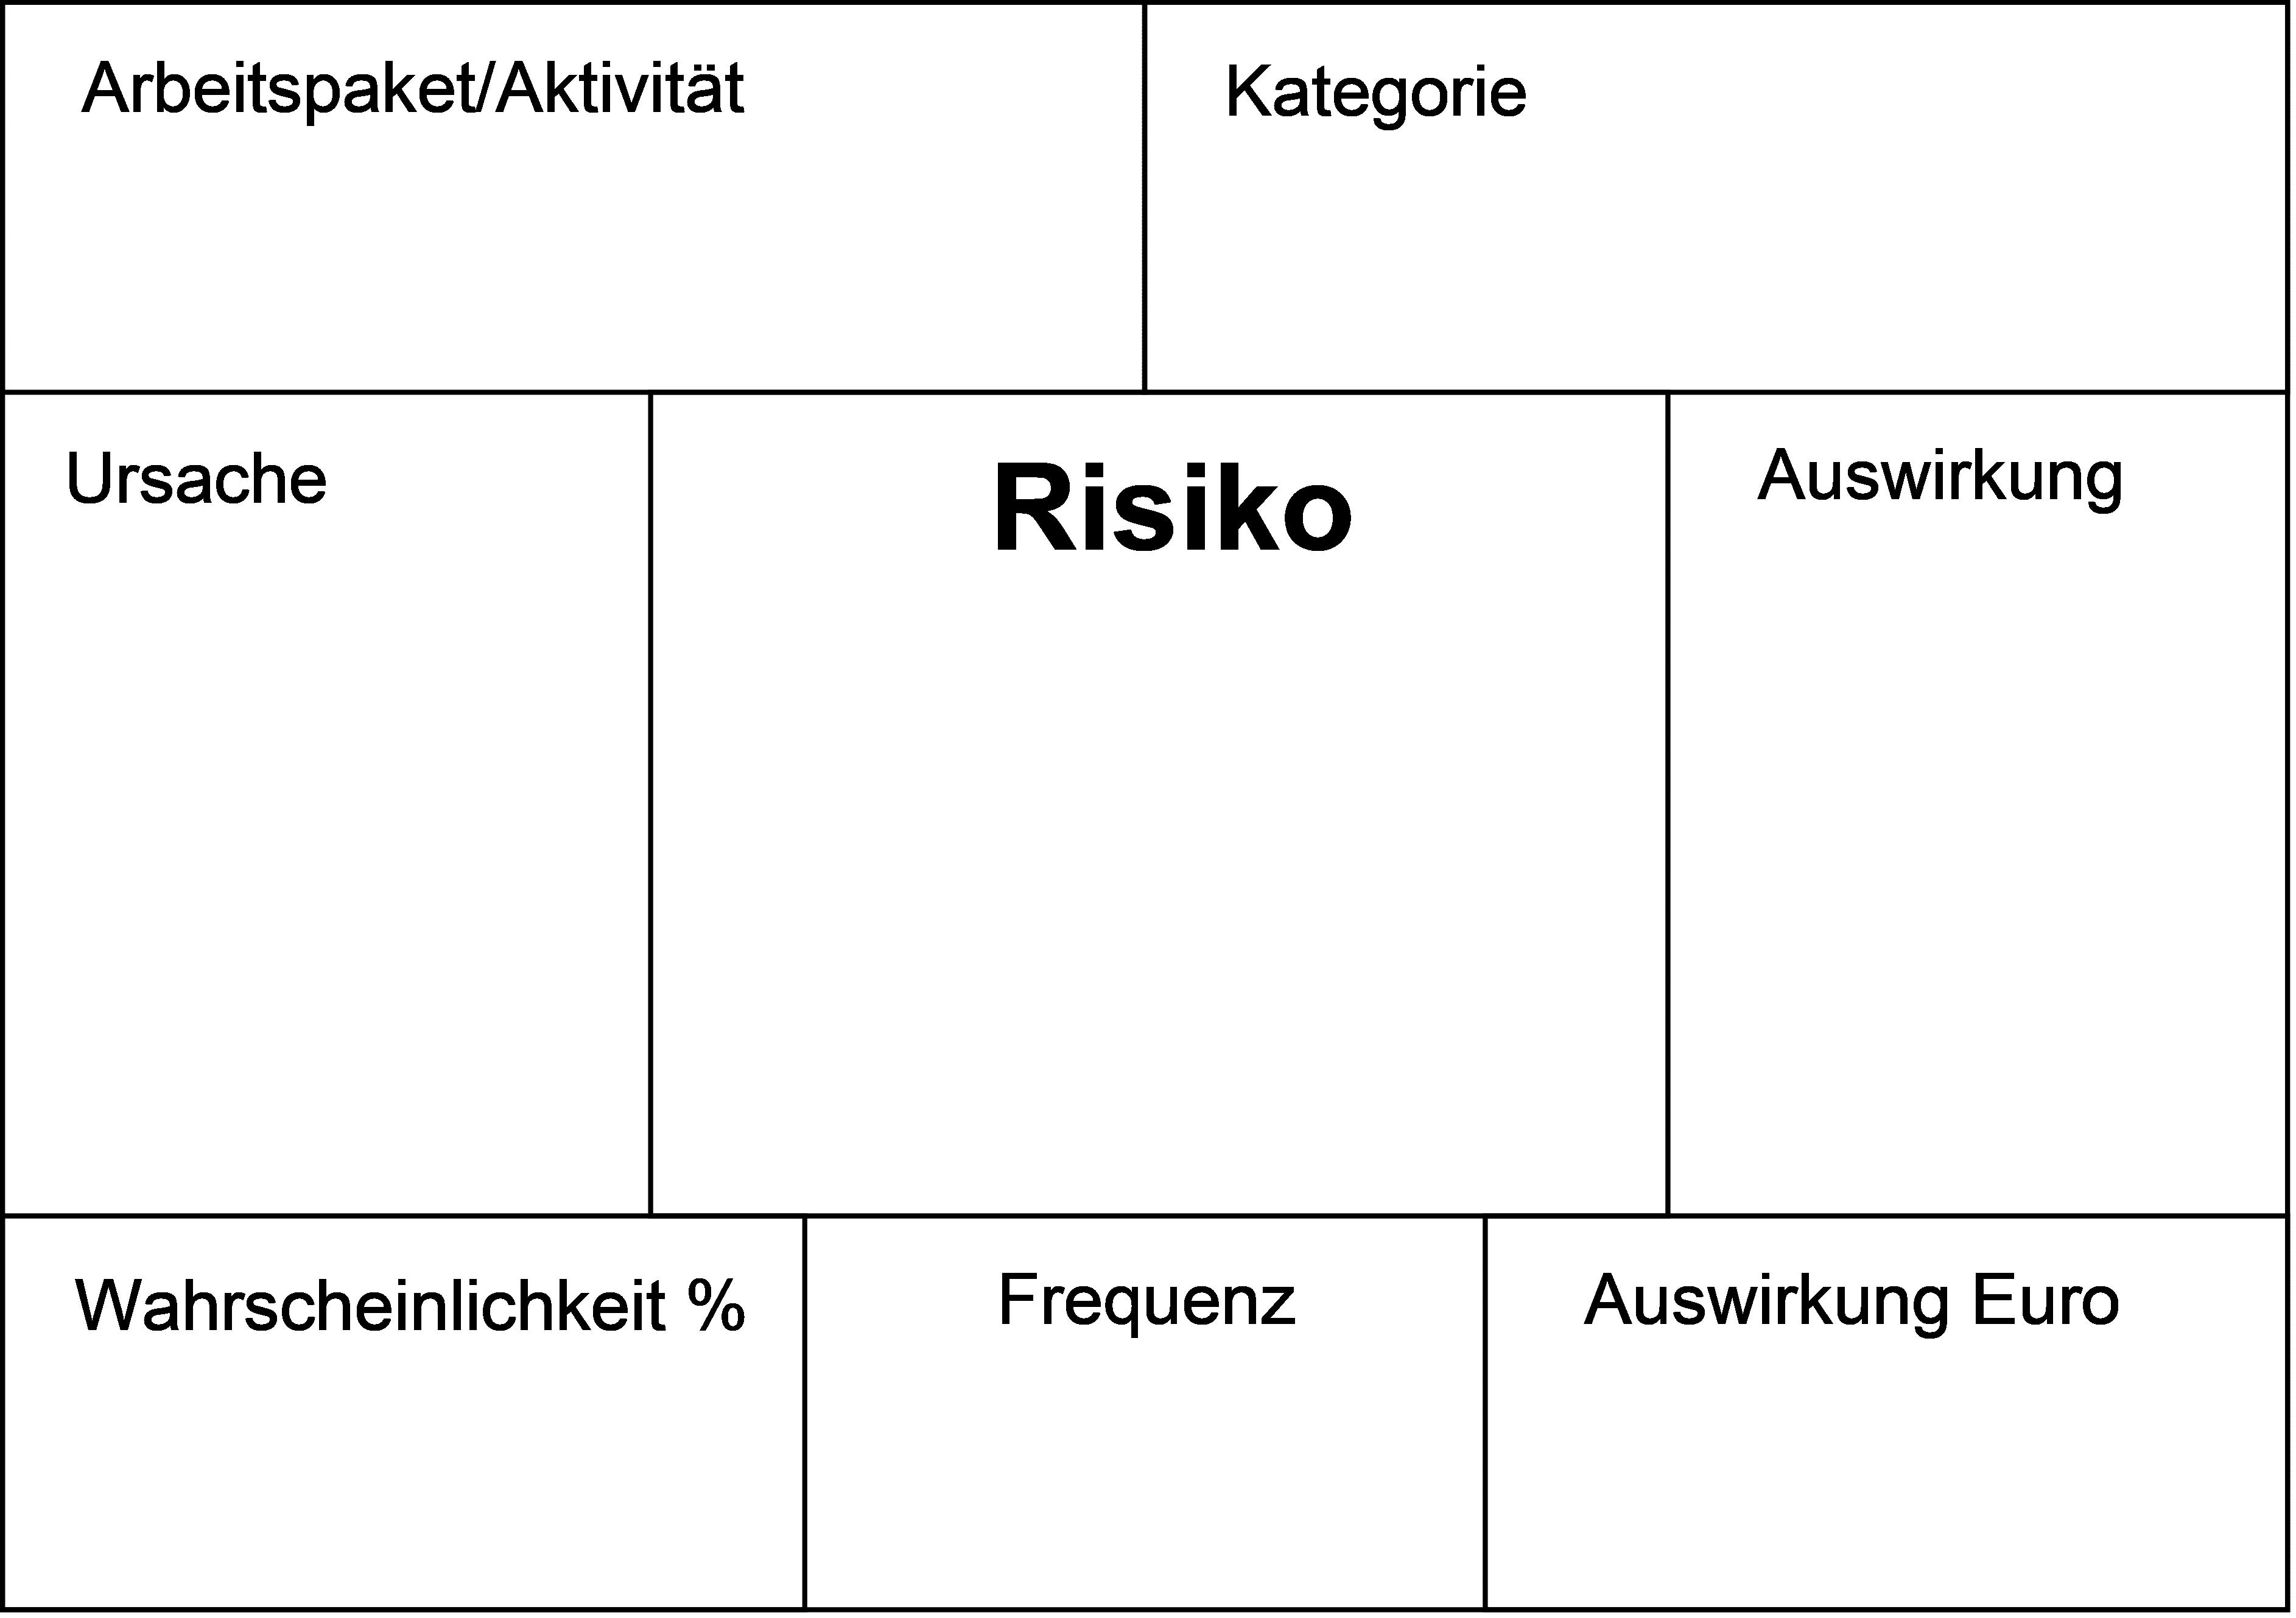 Risiko Pinwandkarten